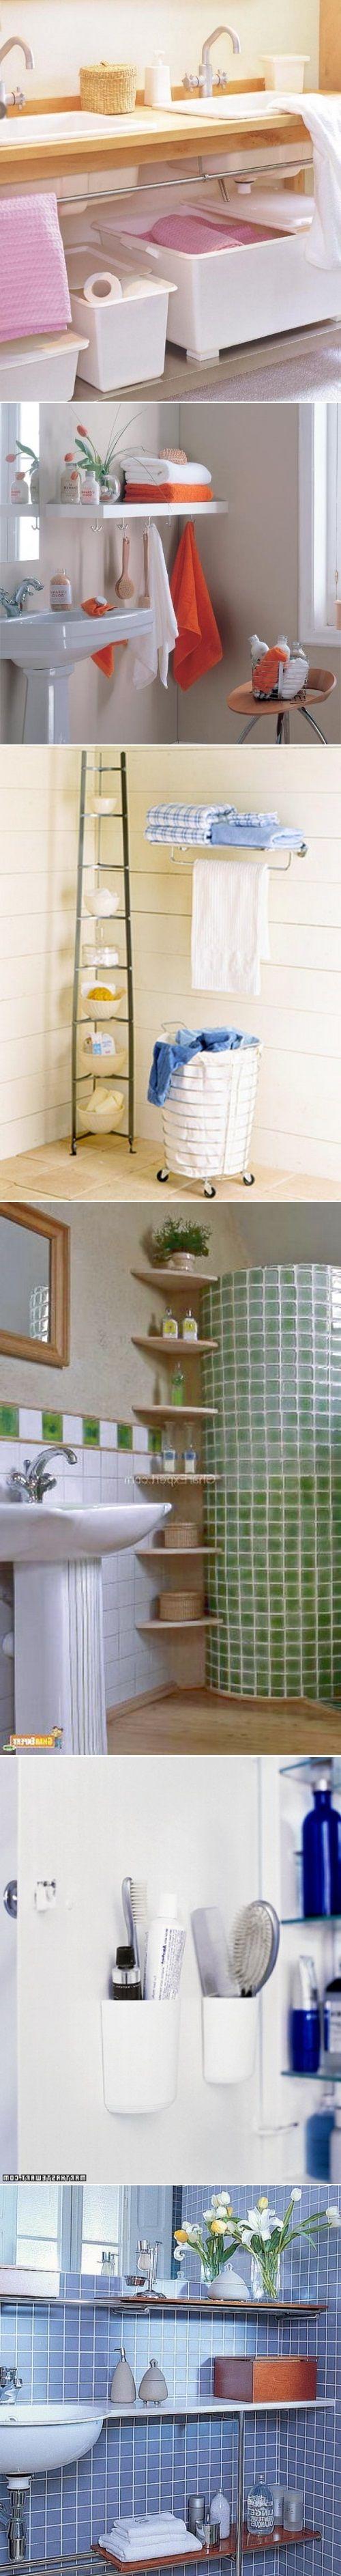 336 best bathroom storage ideas images on pinterest home 336 best bathroom storage ideas images on pinterest home bathroom ideas and room